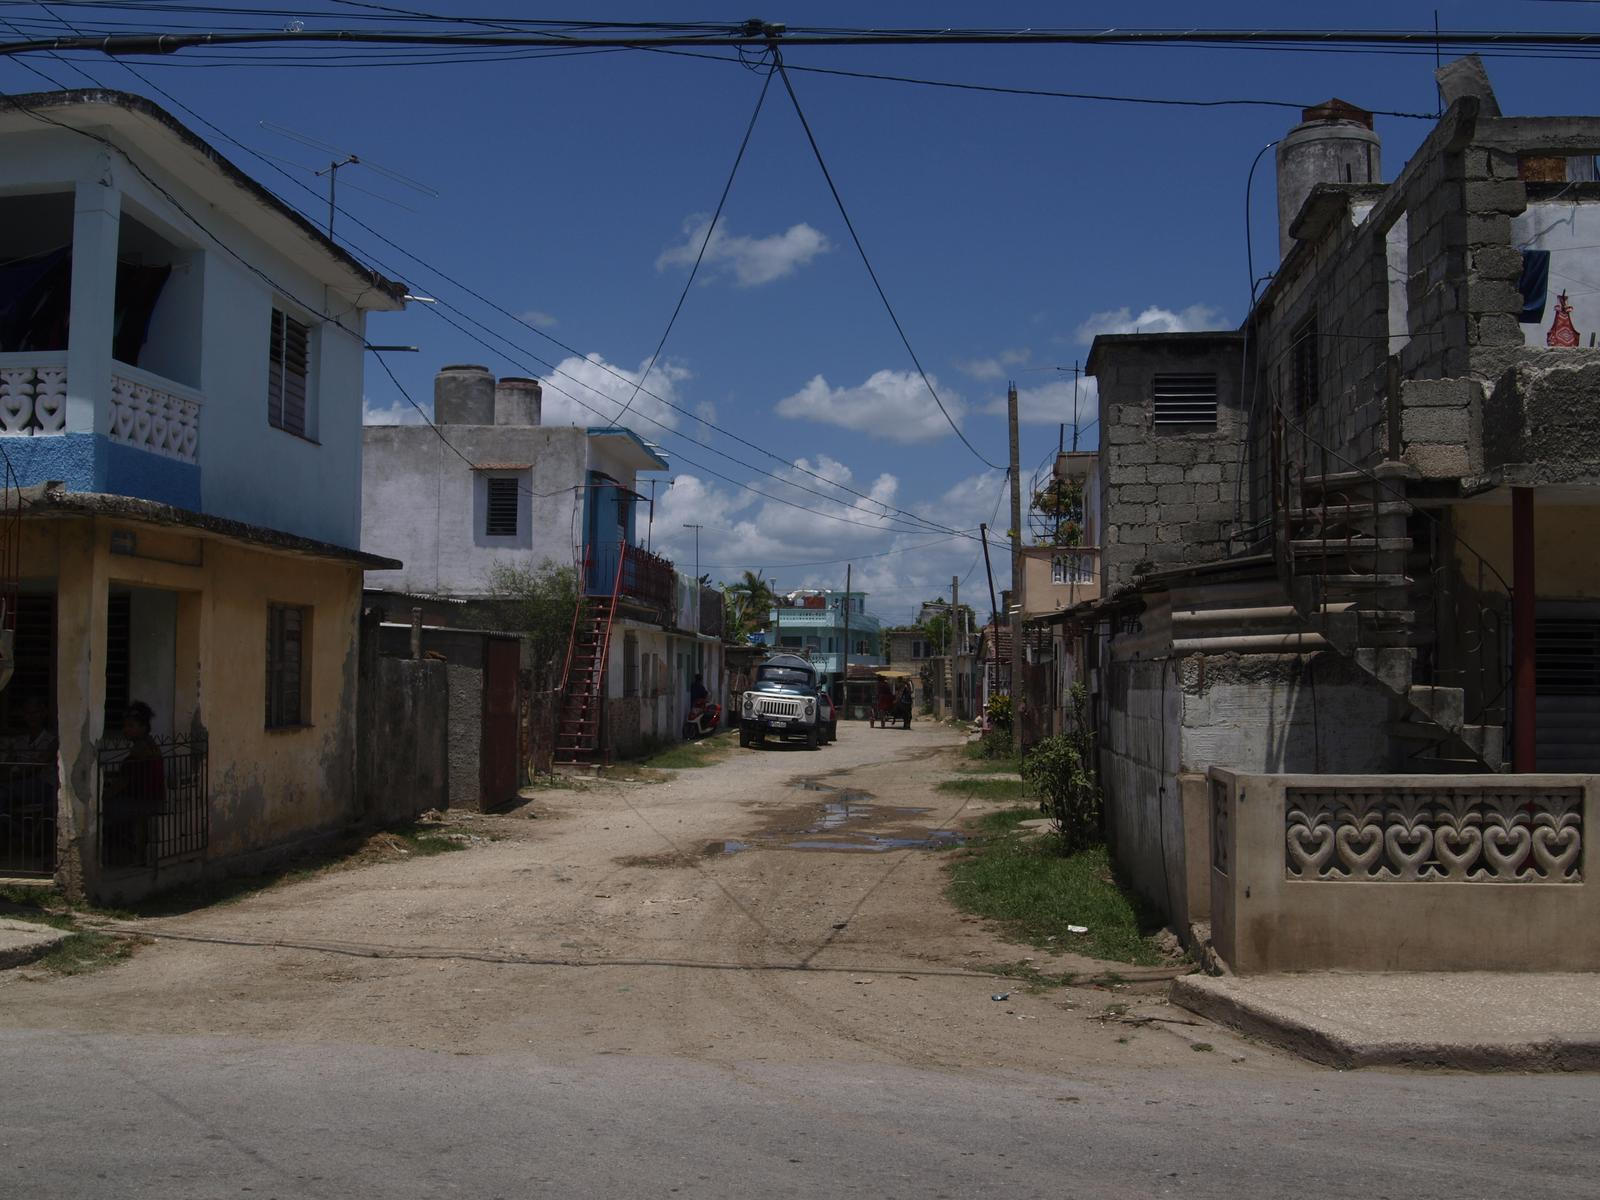 Kuba architektúra - Obrázok č. 9